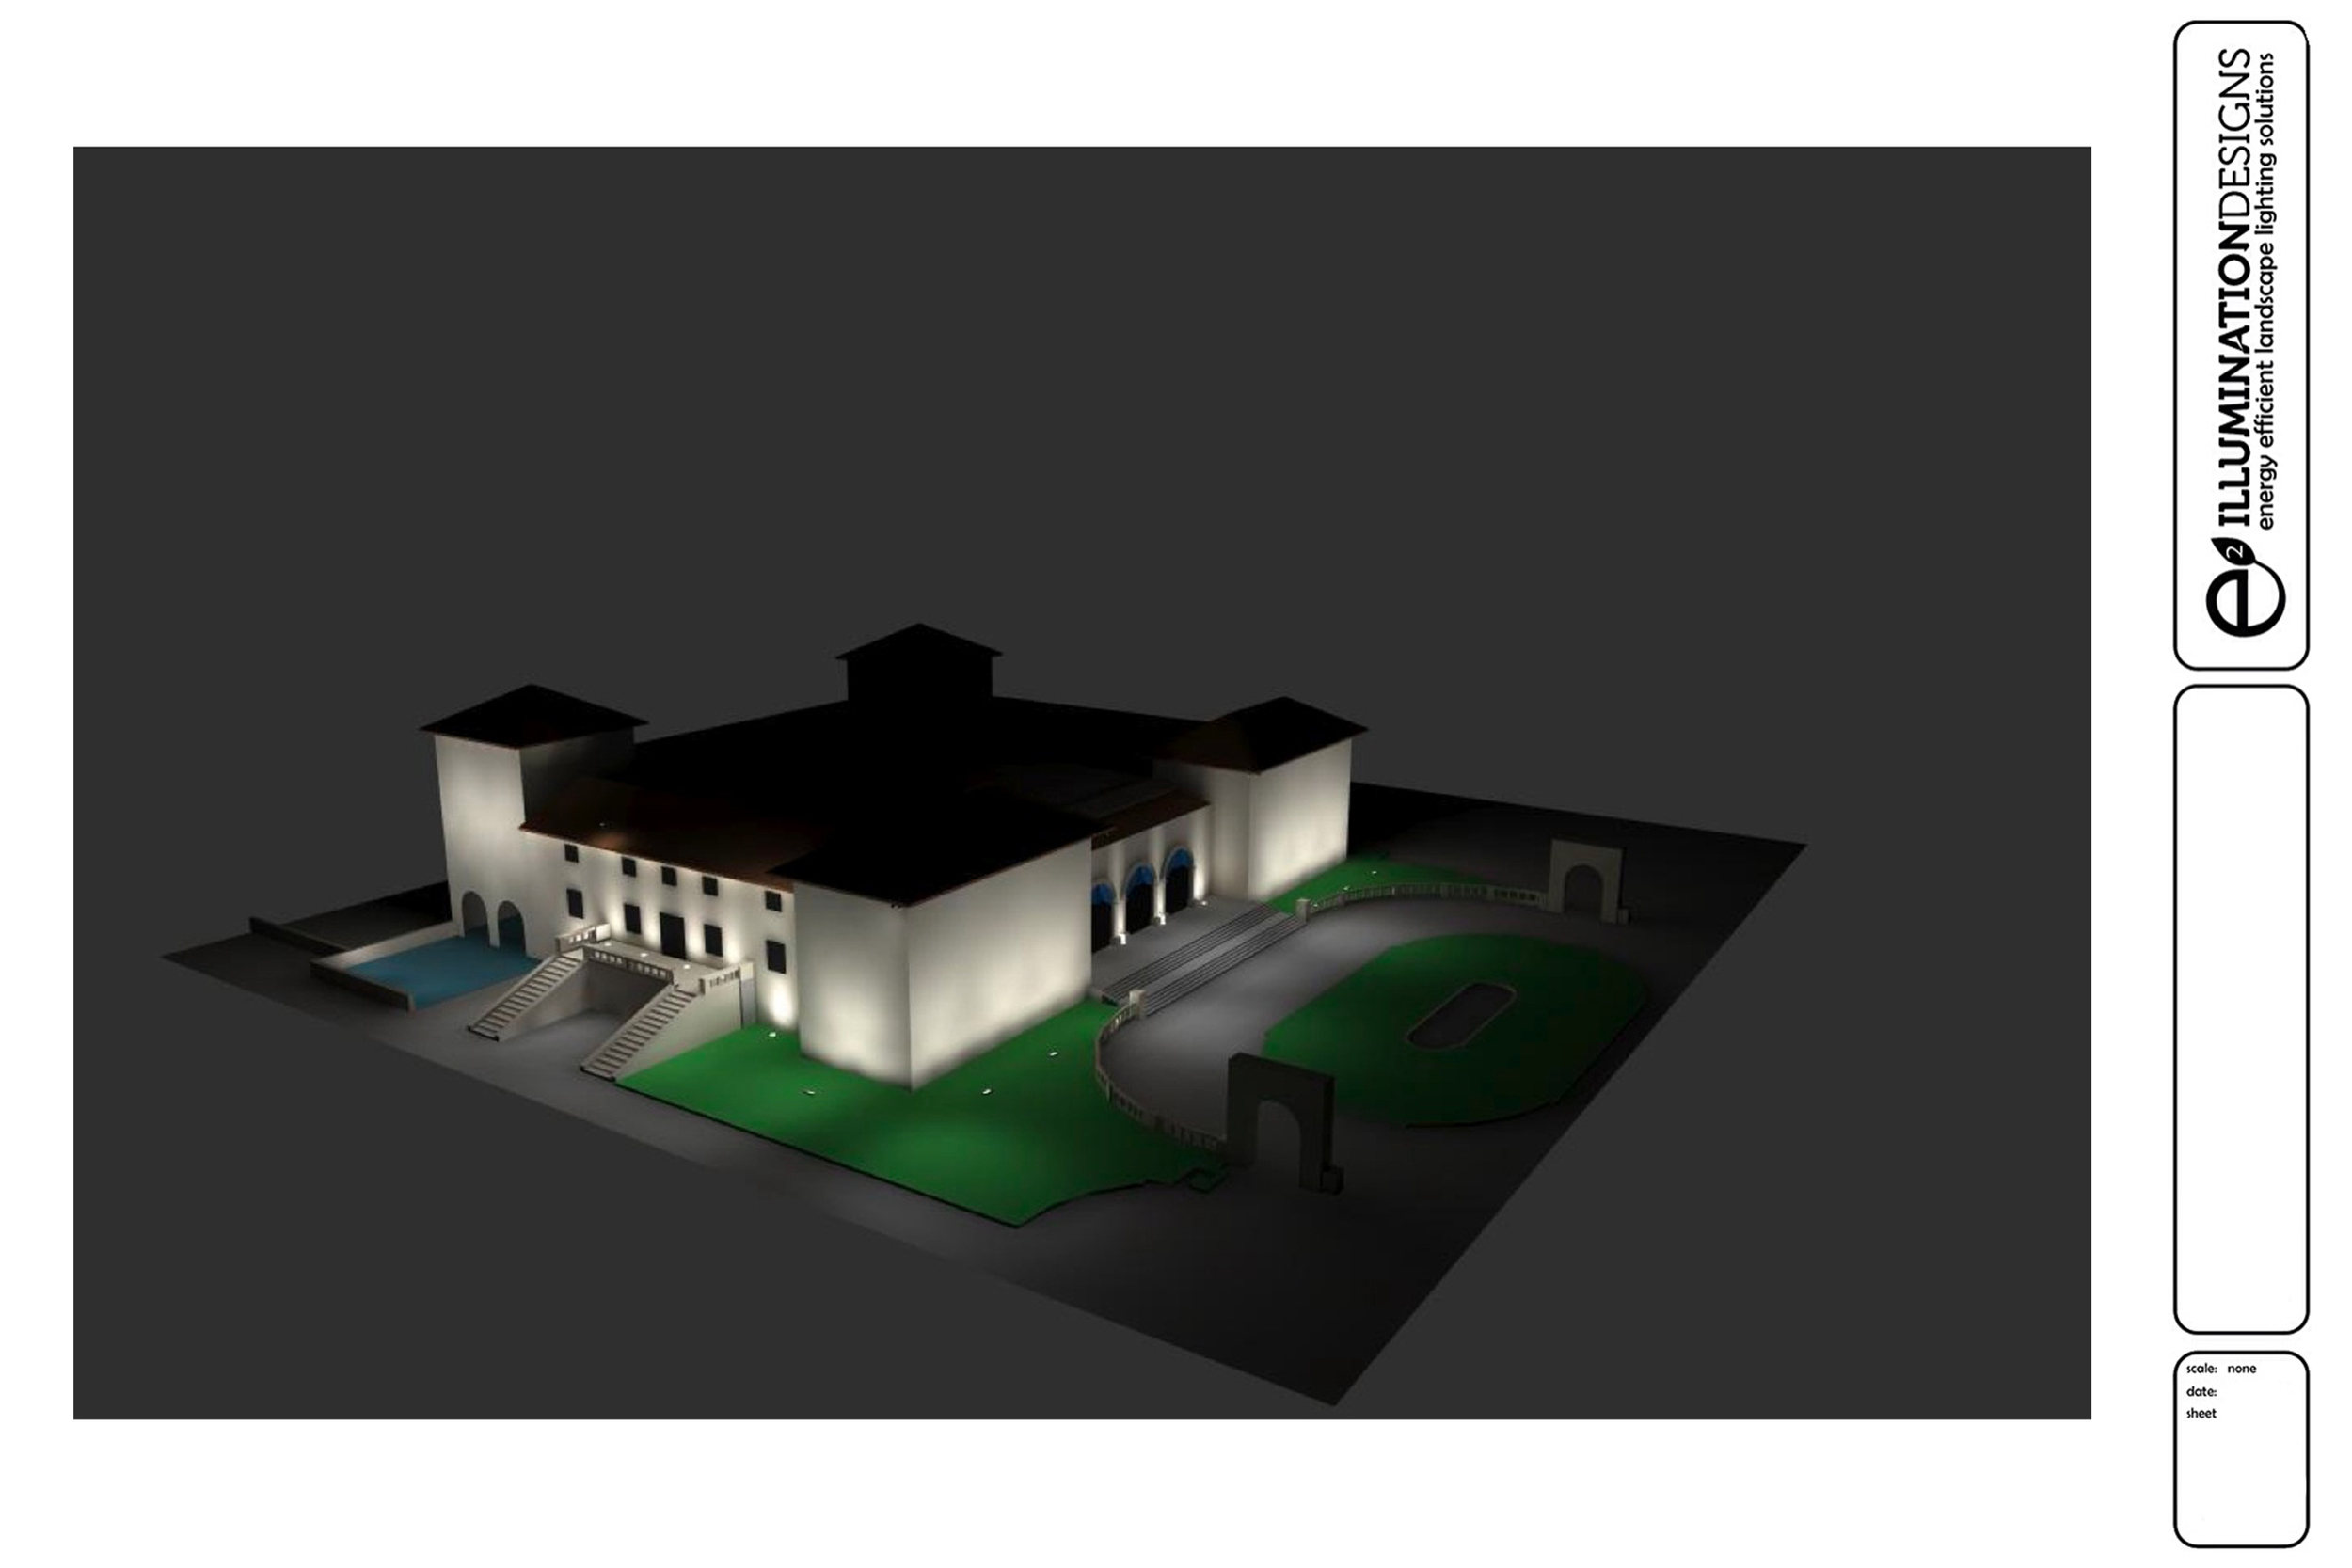 E2 Illumination Designs plan / illustration created by ALA